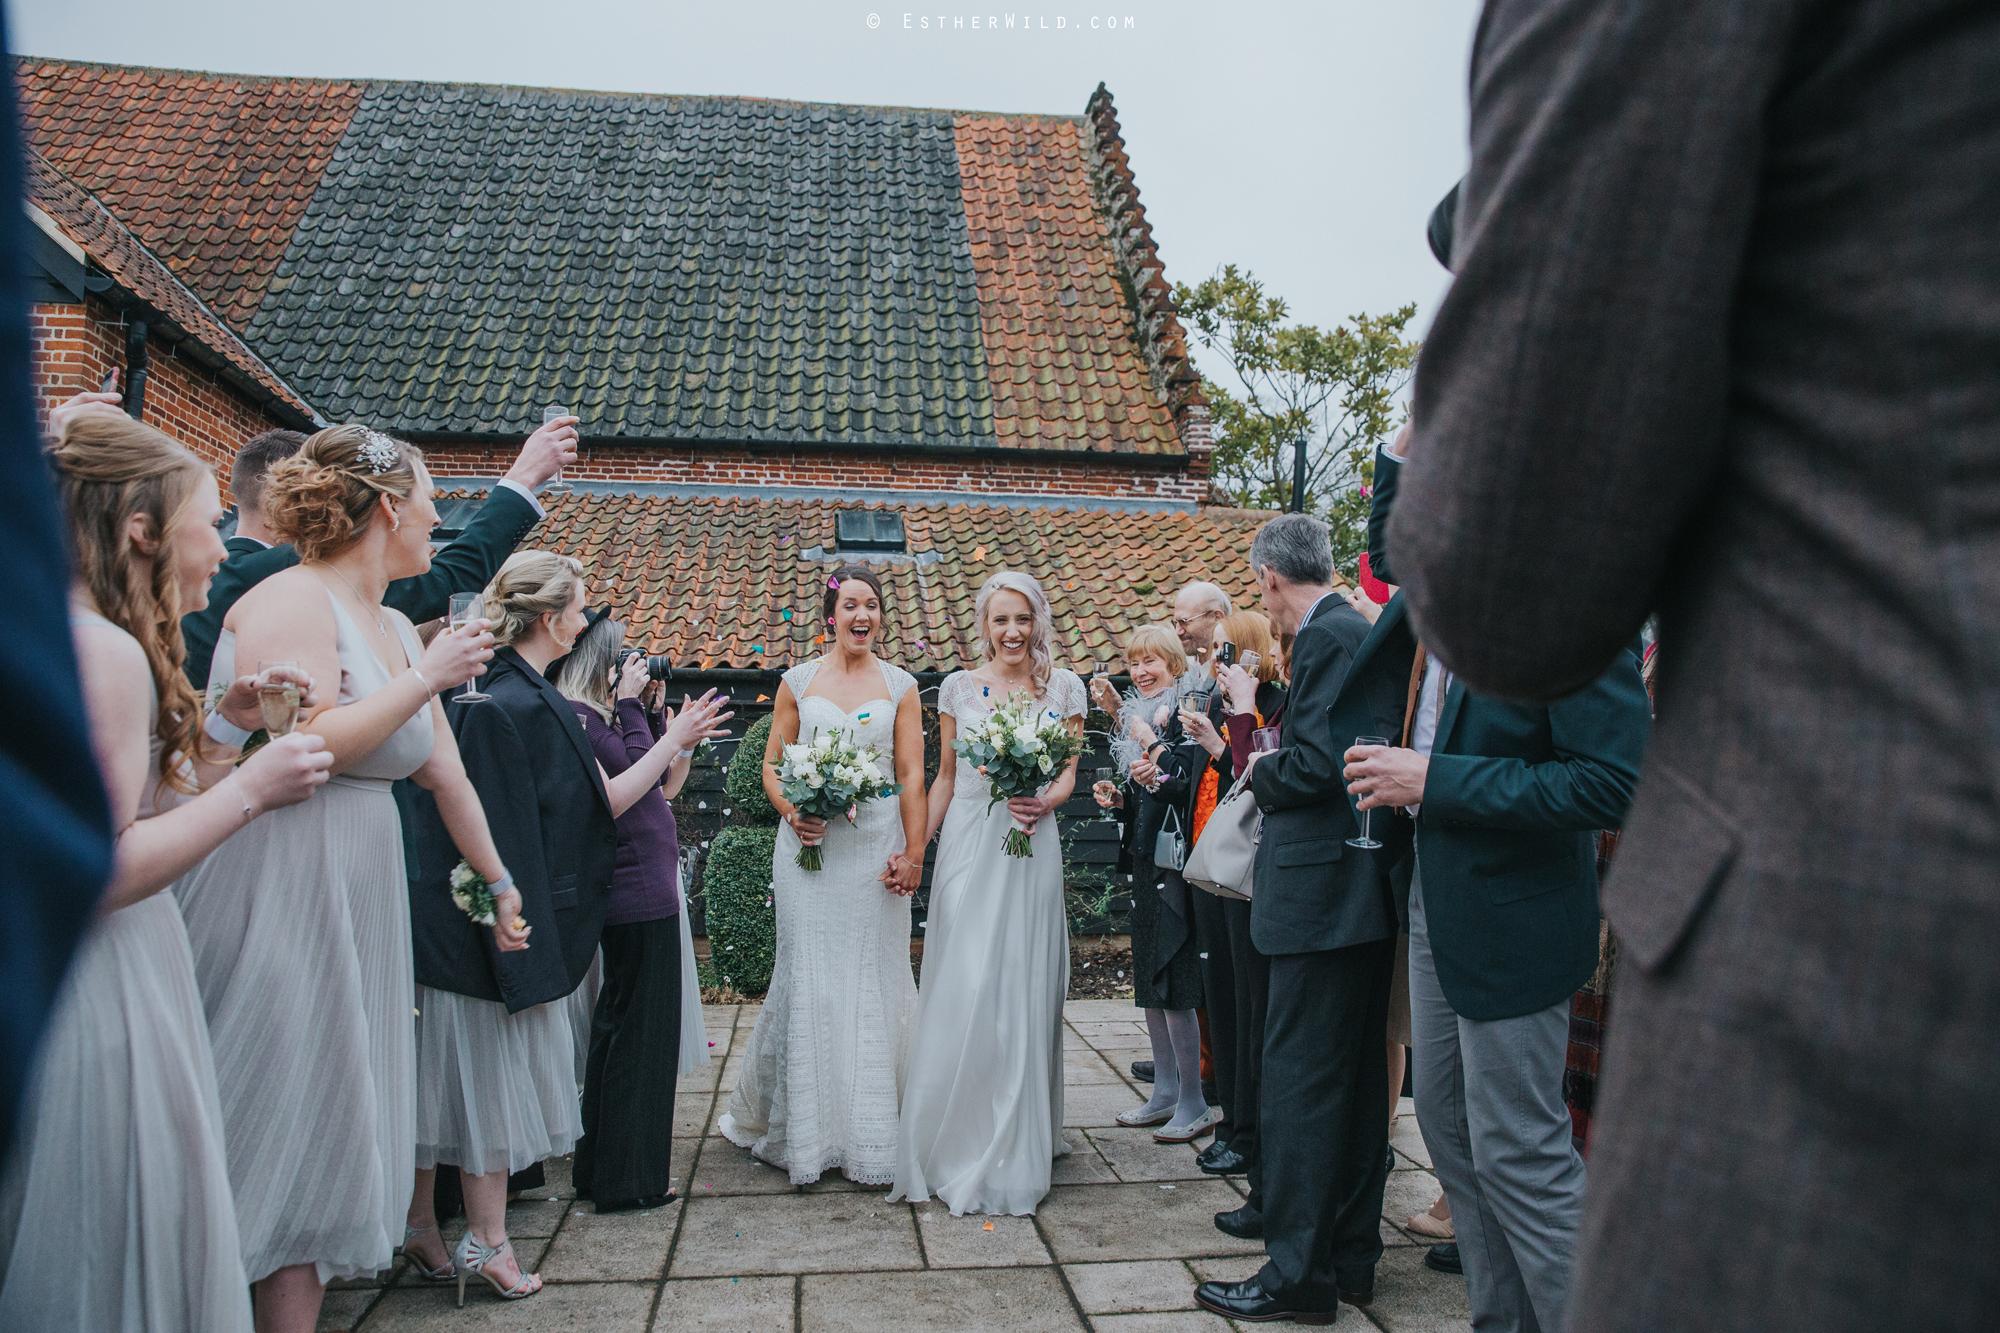 Elms_Barn_Weddings_Suffolk_Photographer_Copyright_Esther_Wild_IMG_1468.jpg